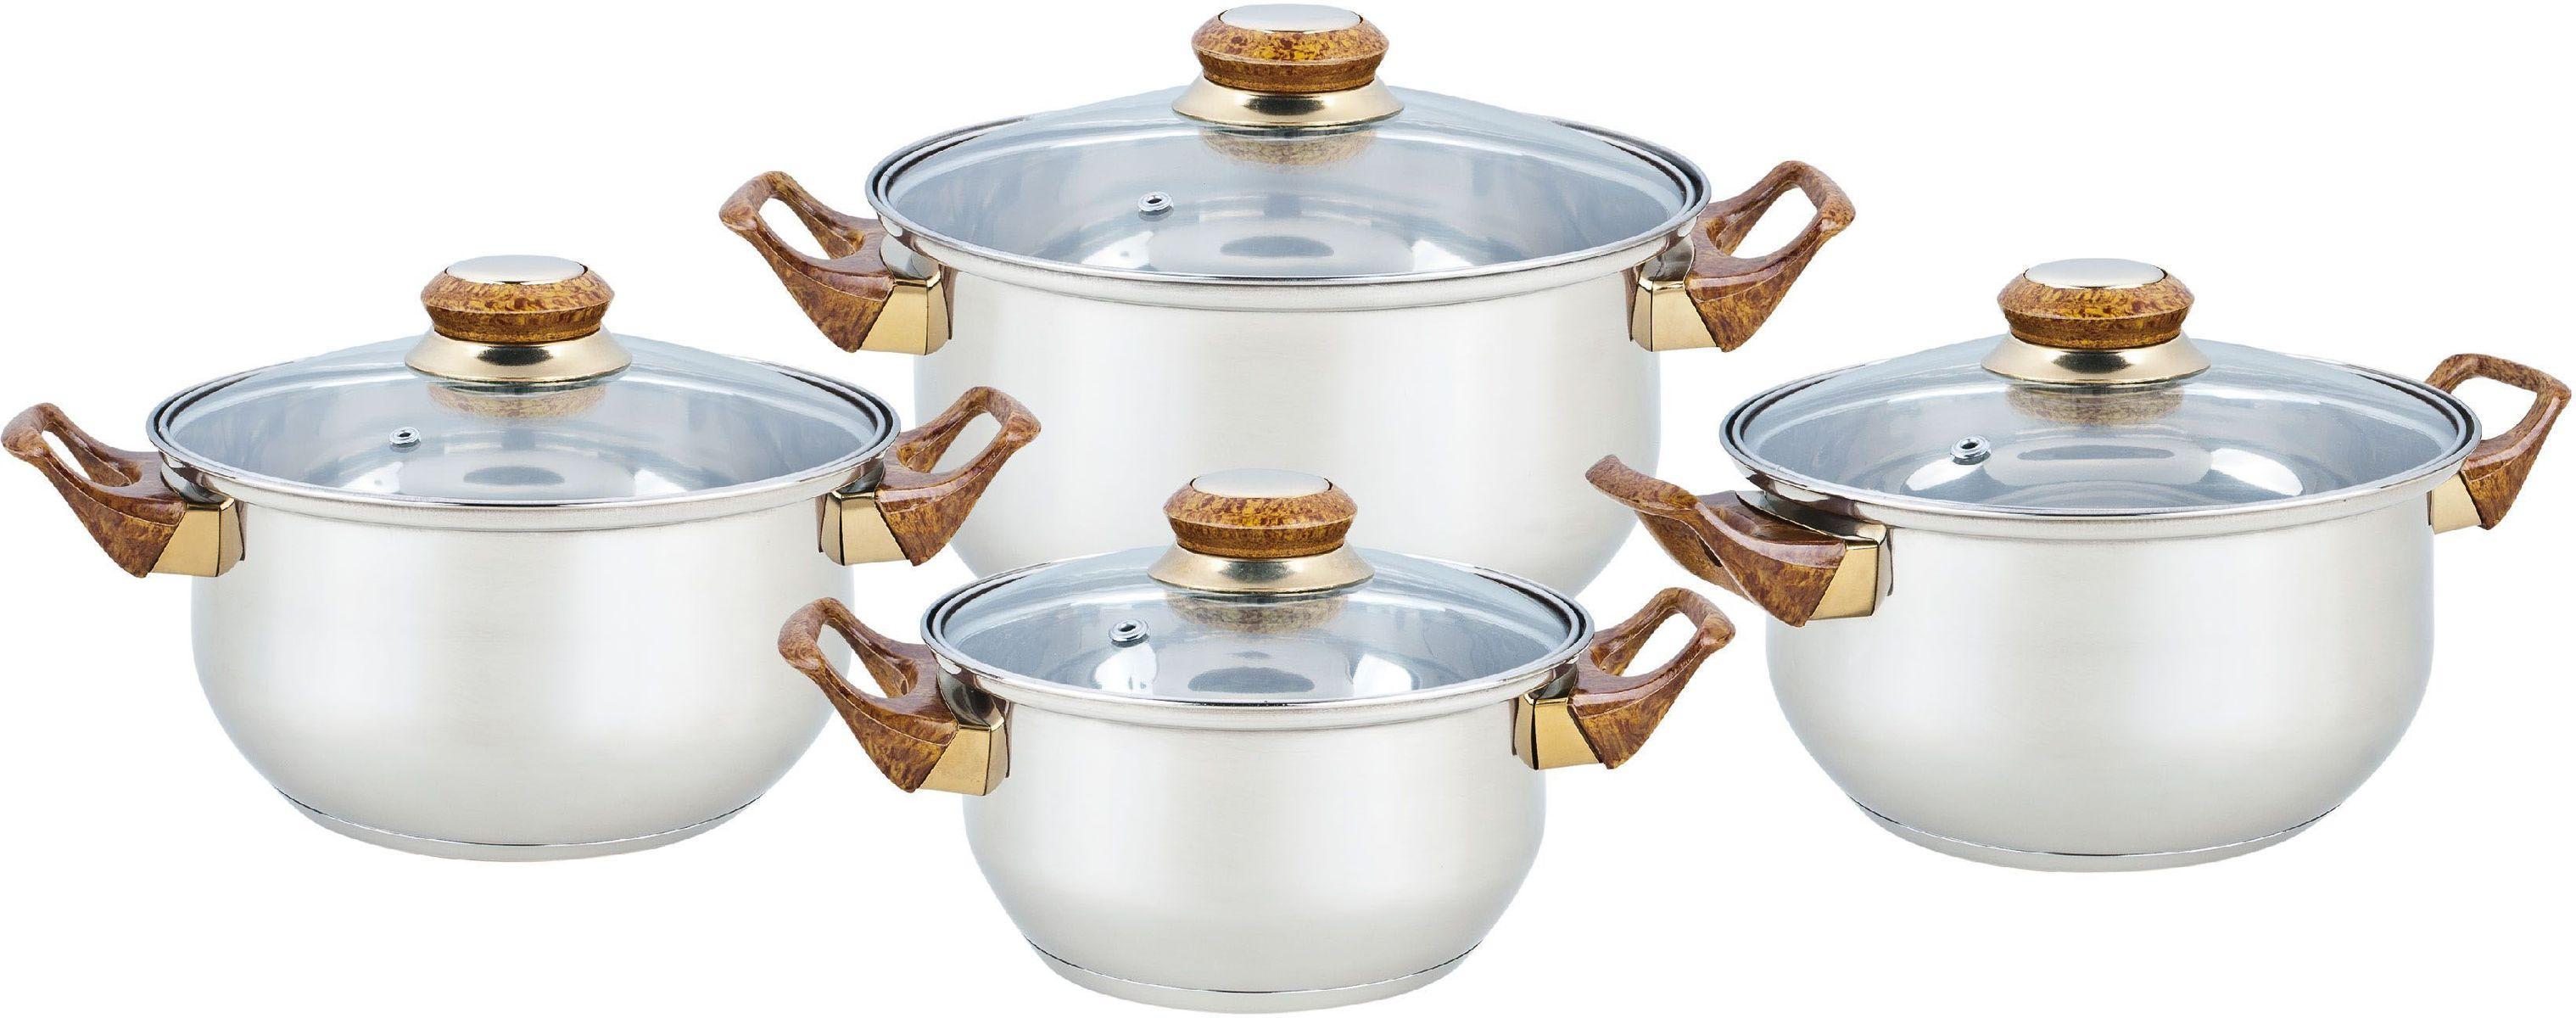 Набор посуды Bekker Classic, 8 предметов. BK-4604 набор посуды bekker classic bk 4604 8 предметов